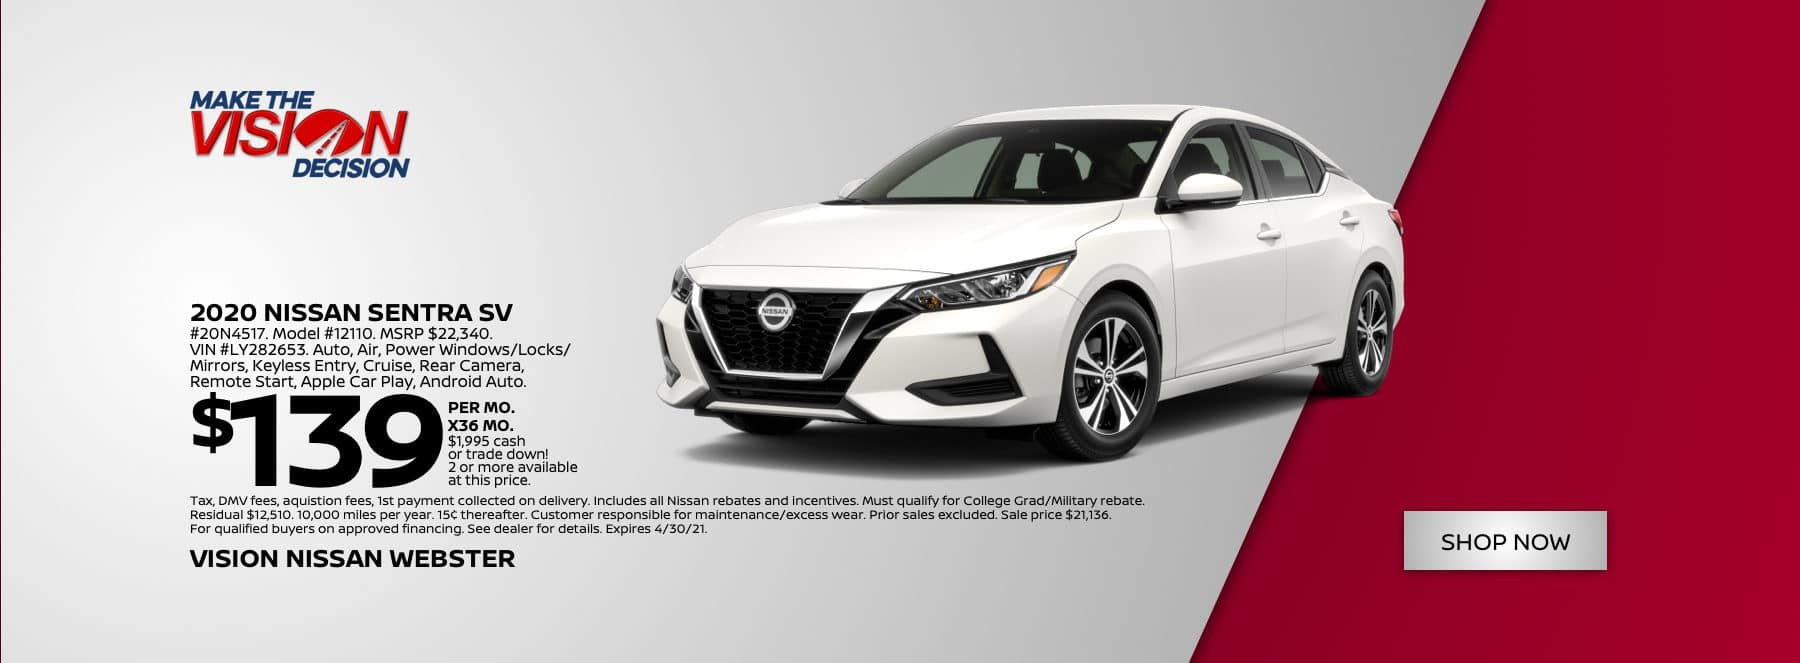 Vision-Nissan-Sliders-0305-Sentra-Web